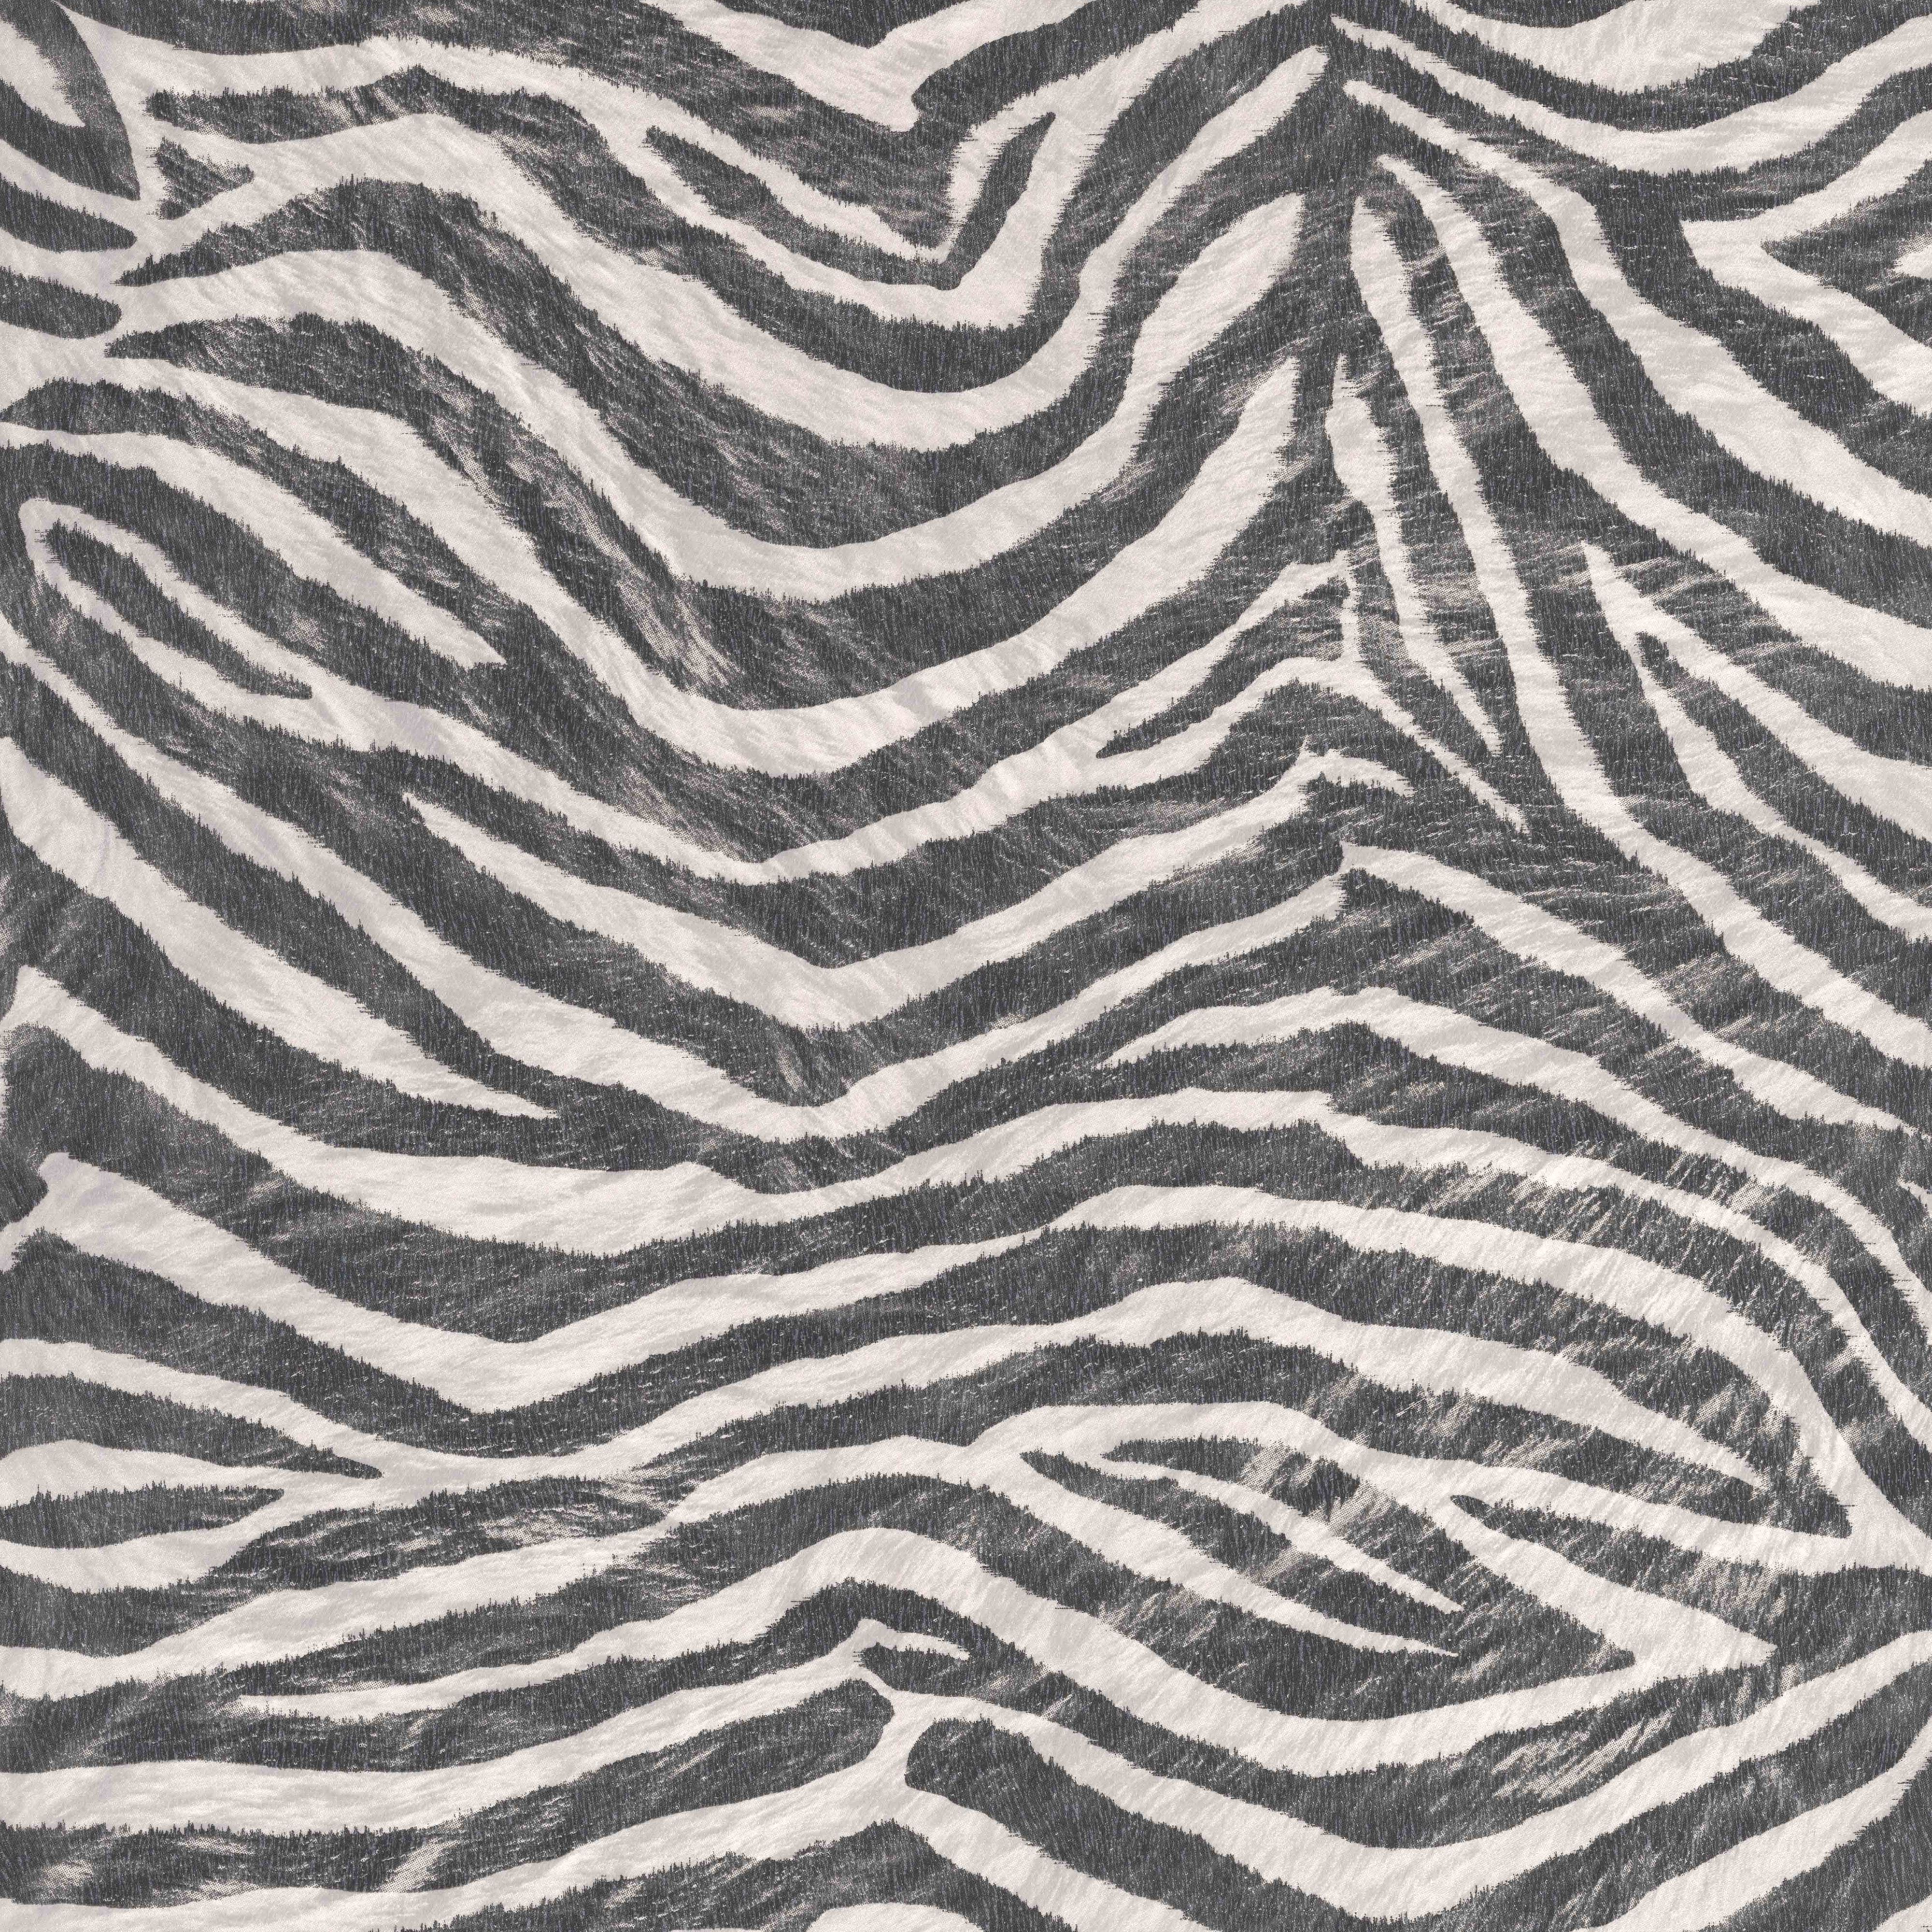 Graham Brown Black White Zebra Stripes Wallpaper Clearance A S Creation Leopard Print